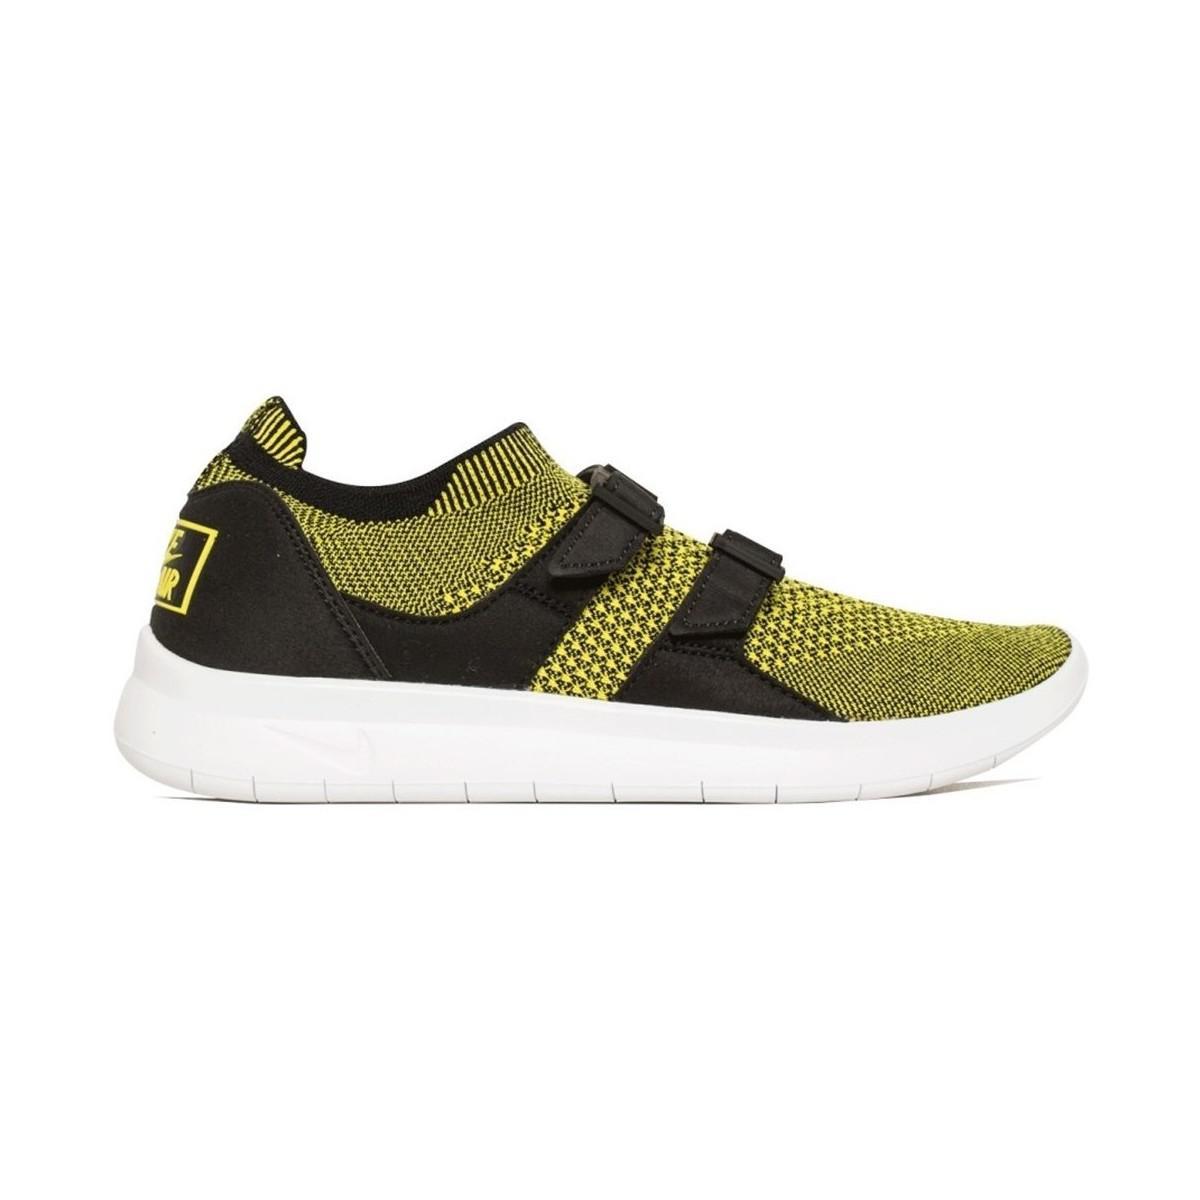 da6492b8dda8 Nike Air Sock Racer Ultra Flyknit Men s Shoes (trainers) In Yellow ...